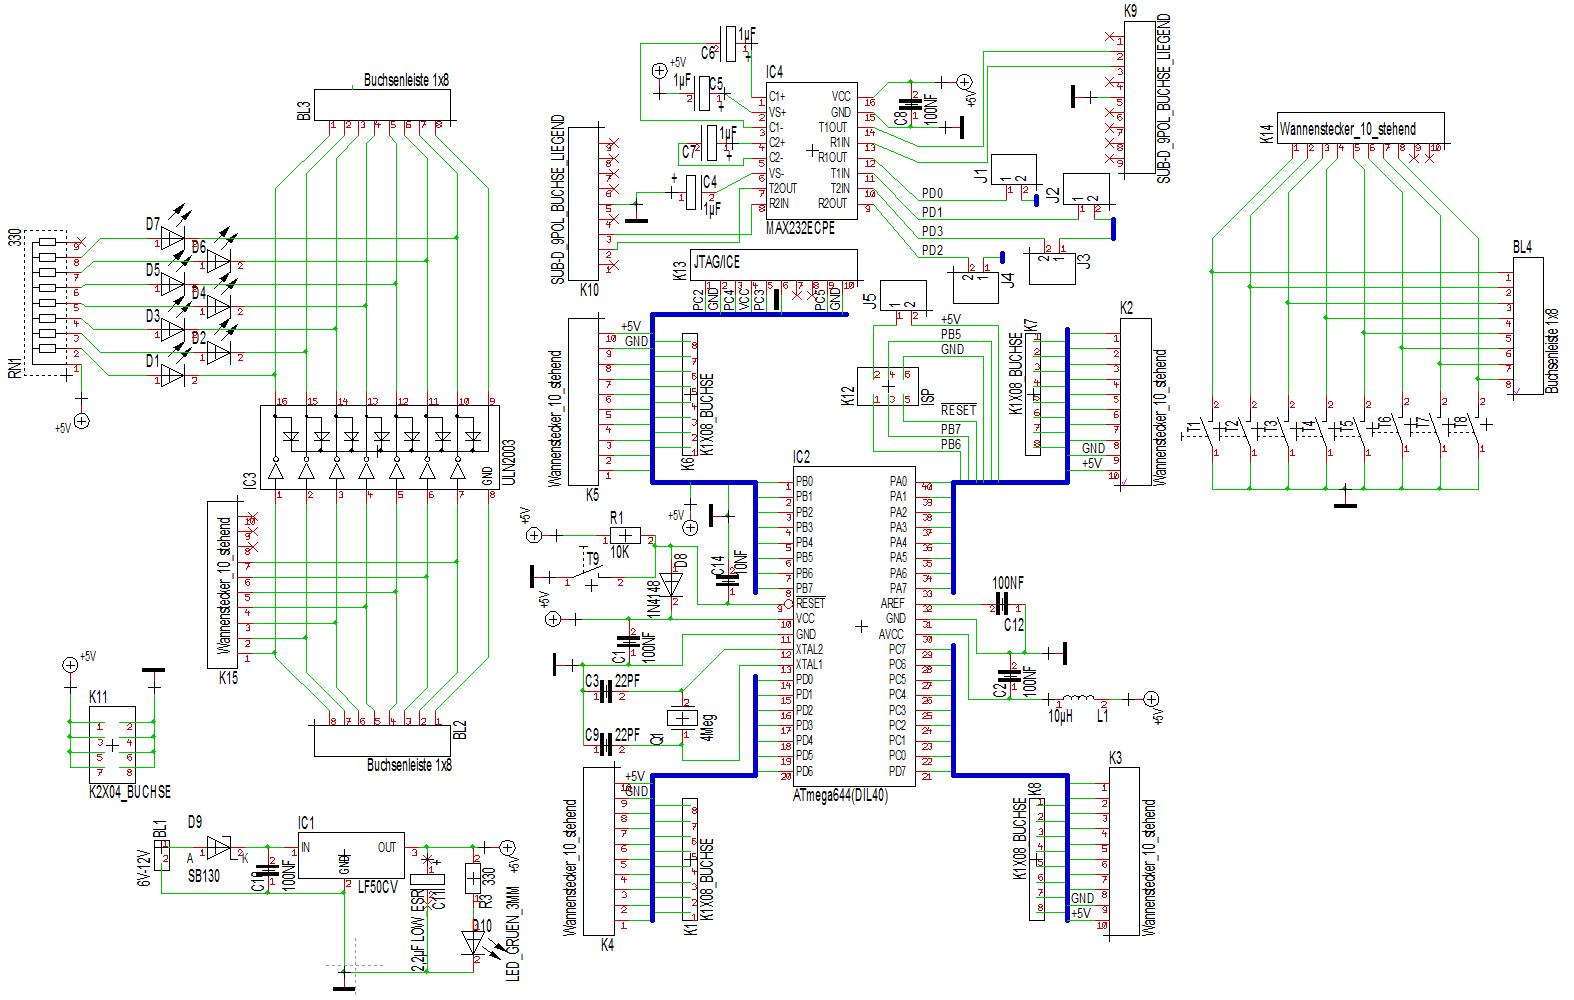 Groß Wandofen Schaltplan Fotos - Elektrische Schaltplan-Ideen ...